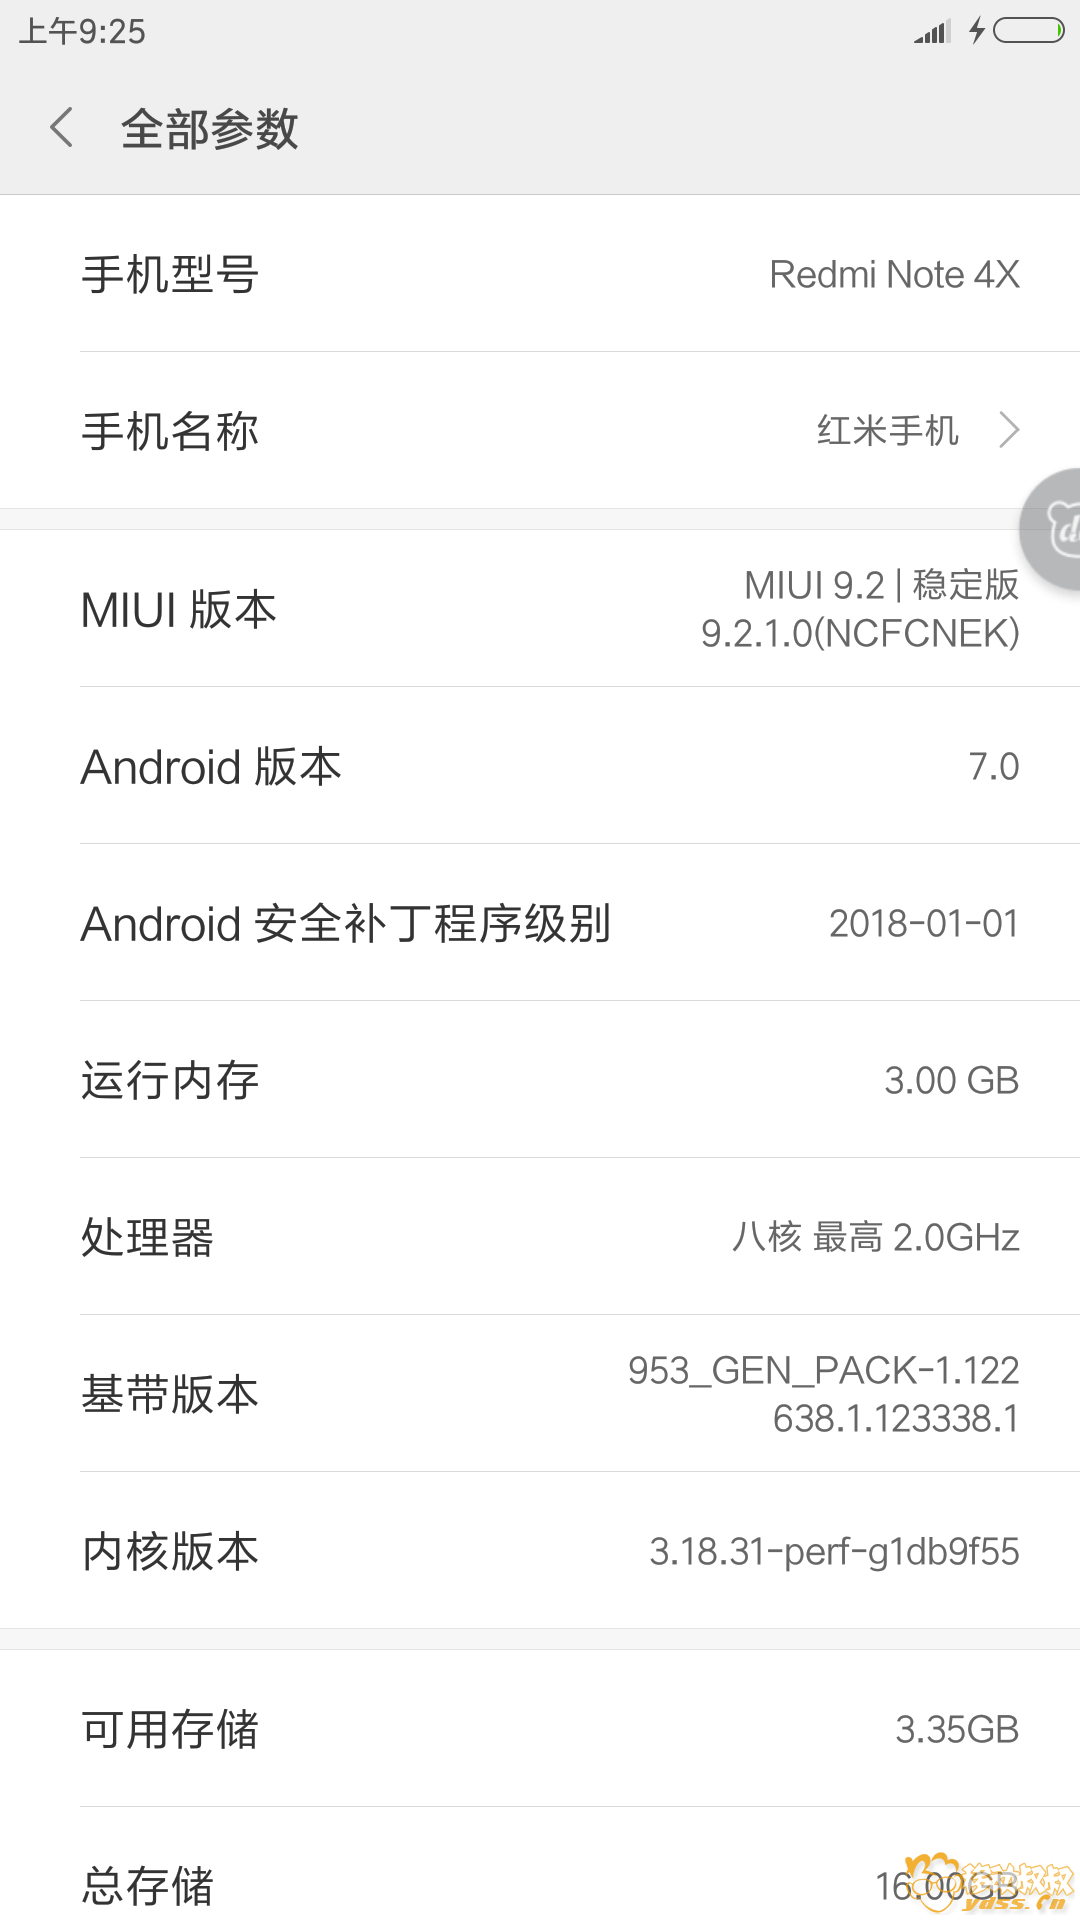 Screenshot_2018-02-12-09-25-07-872_com.android.settings.png